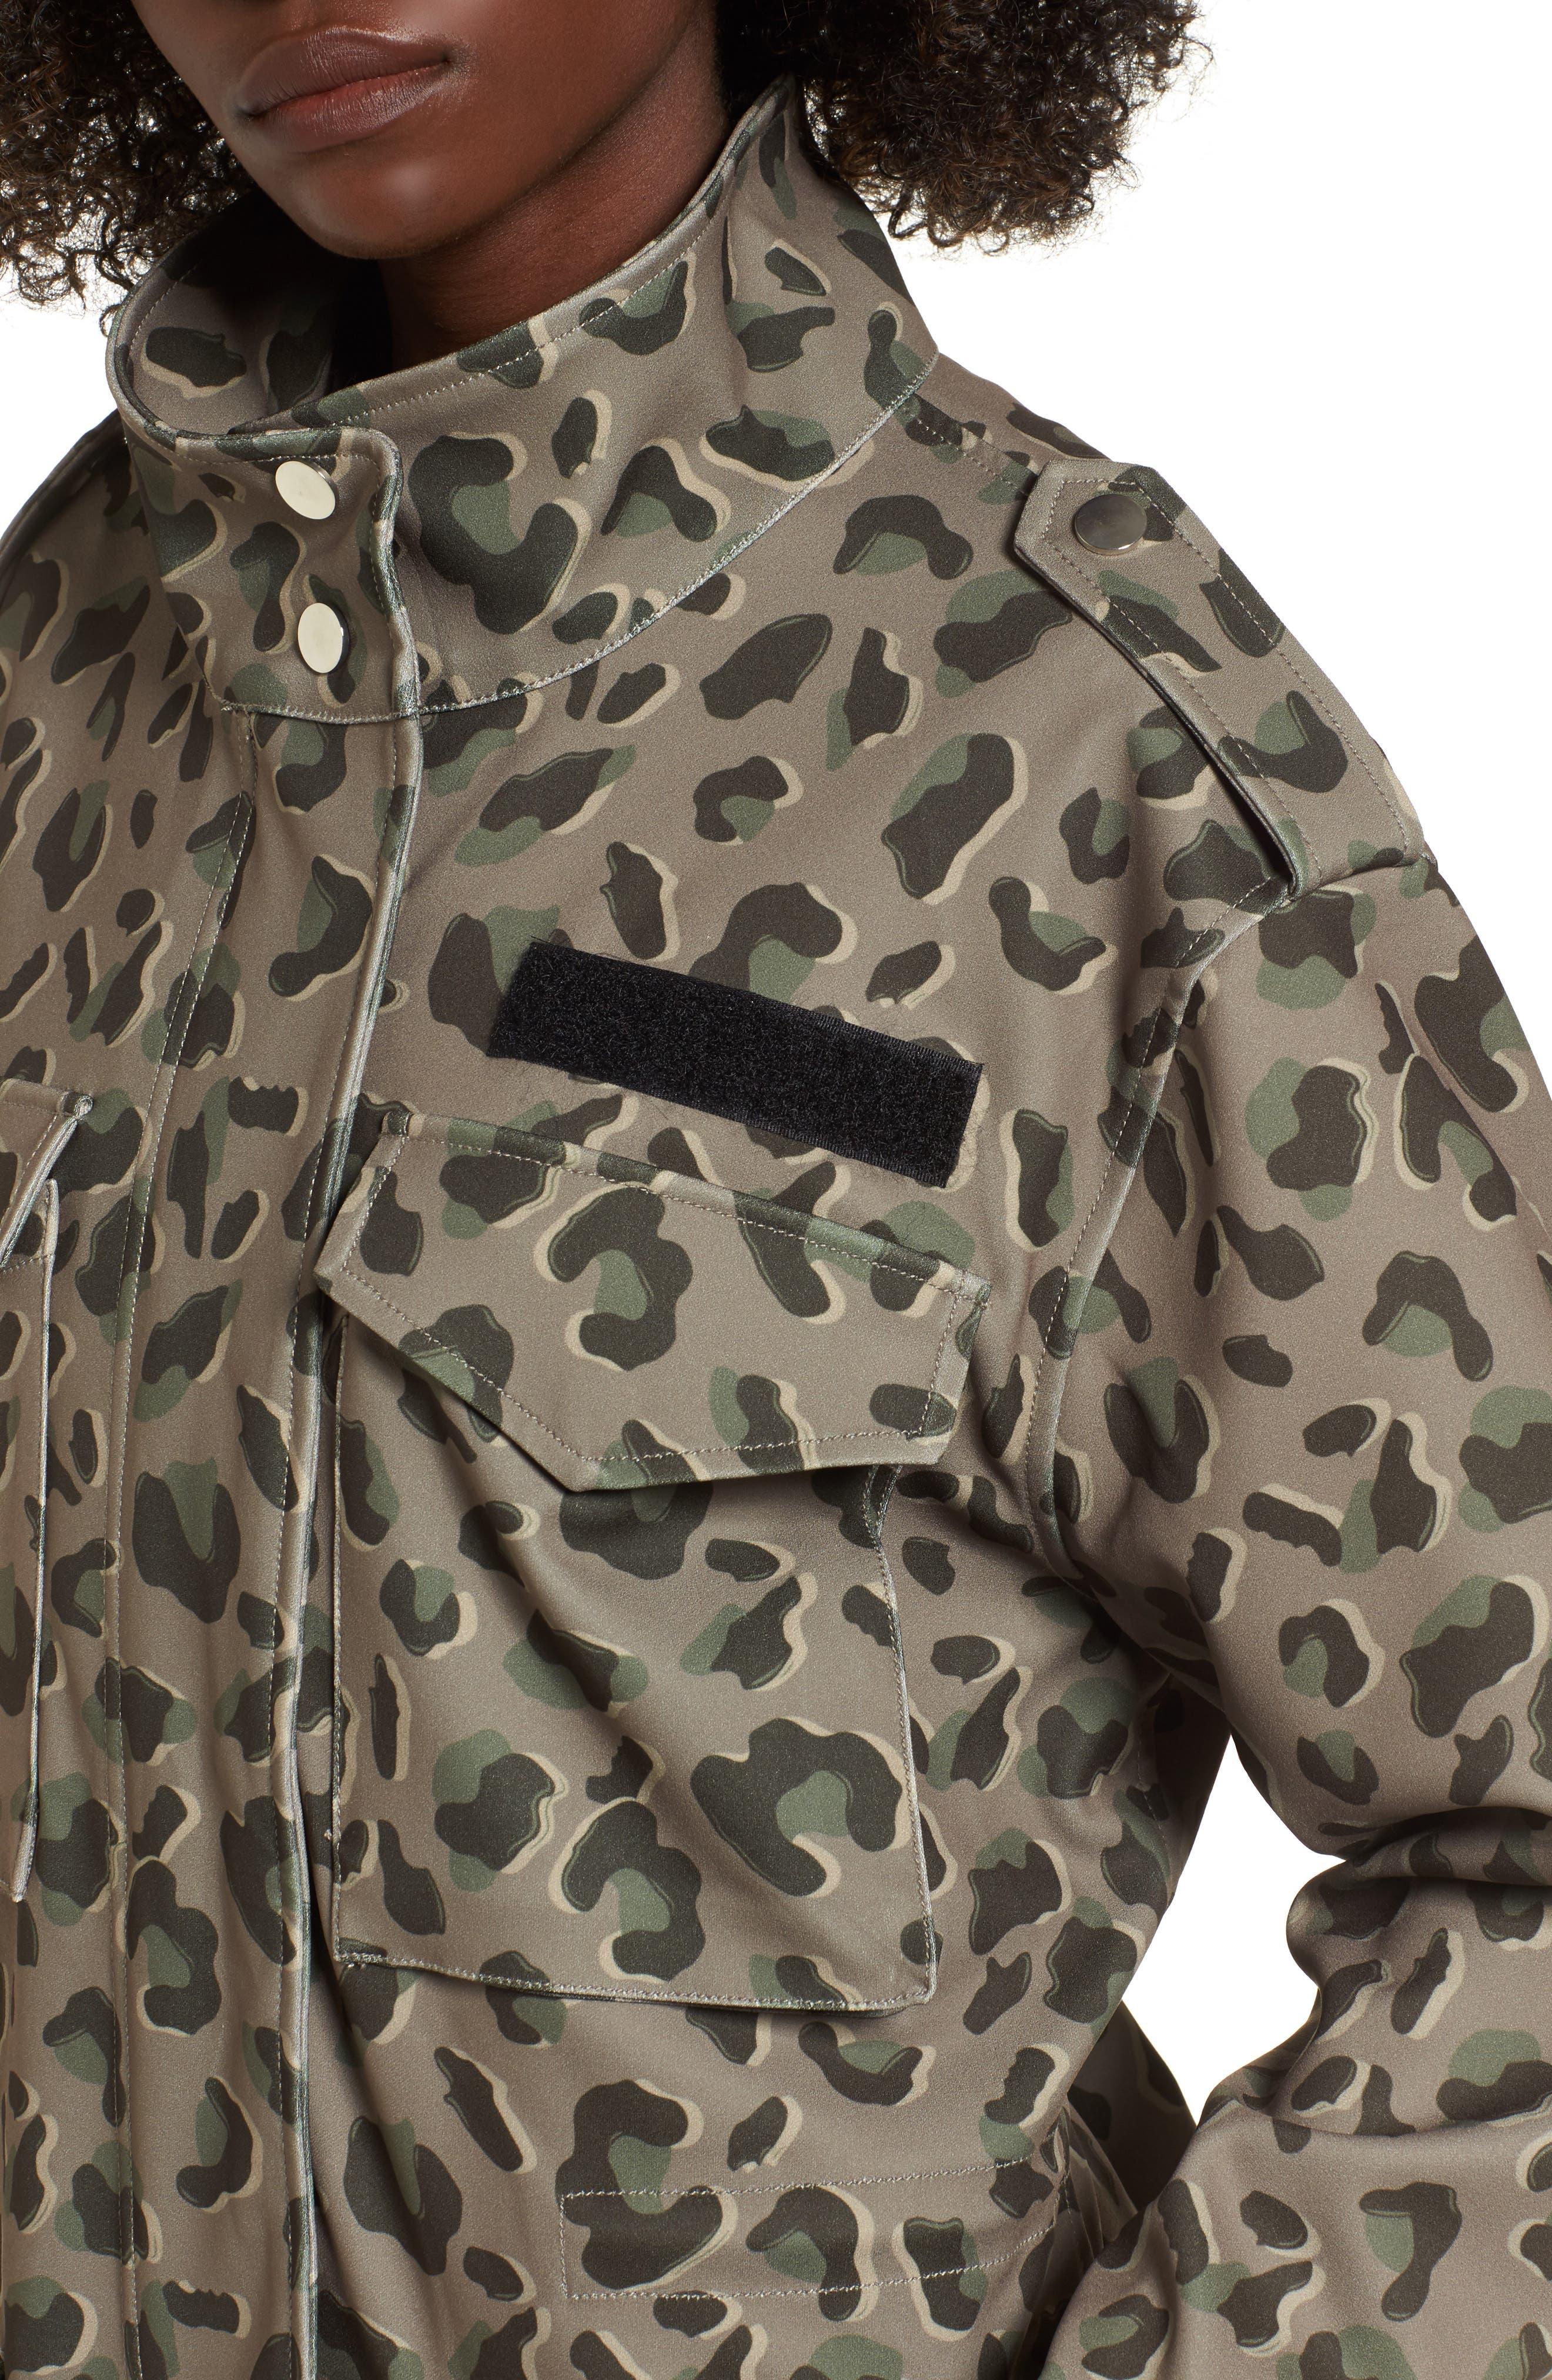 Osy Camo Print Jacket,                             Alternate thumbnail 4, color,                             Camo Print